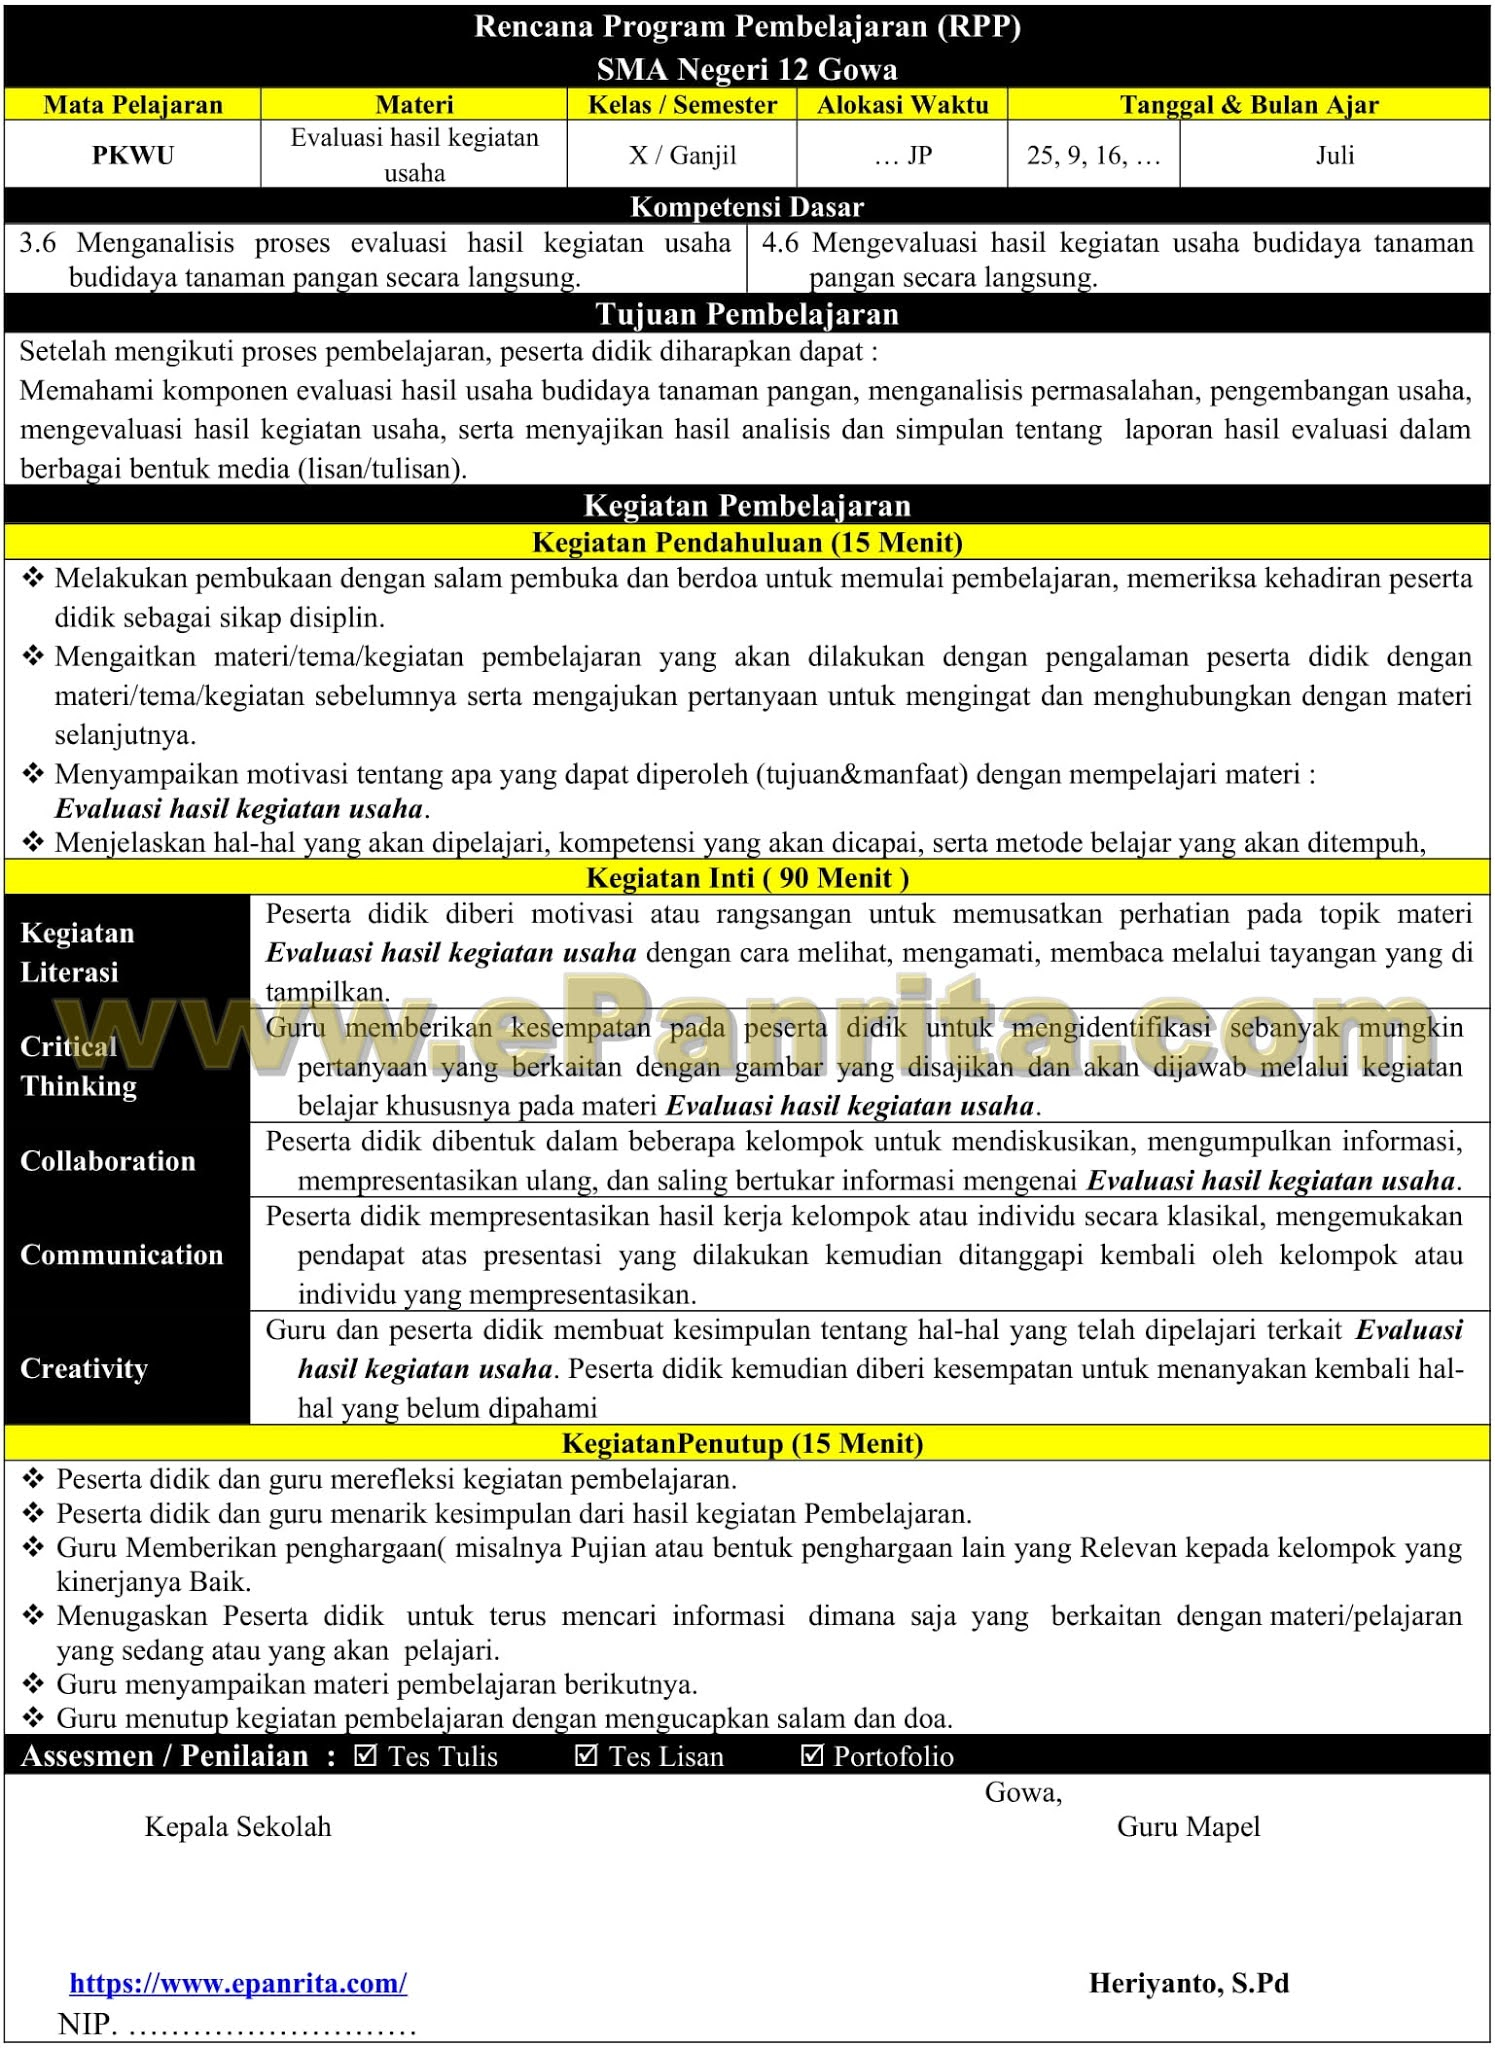 RPP 1 Halaman Prakarya Aspek Budidaya (Evaluasi hasil kegiatan usaha)